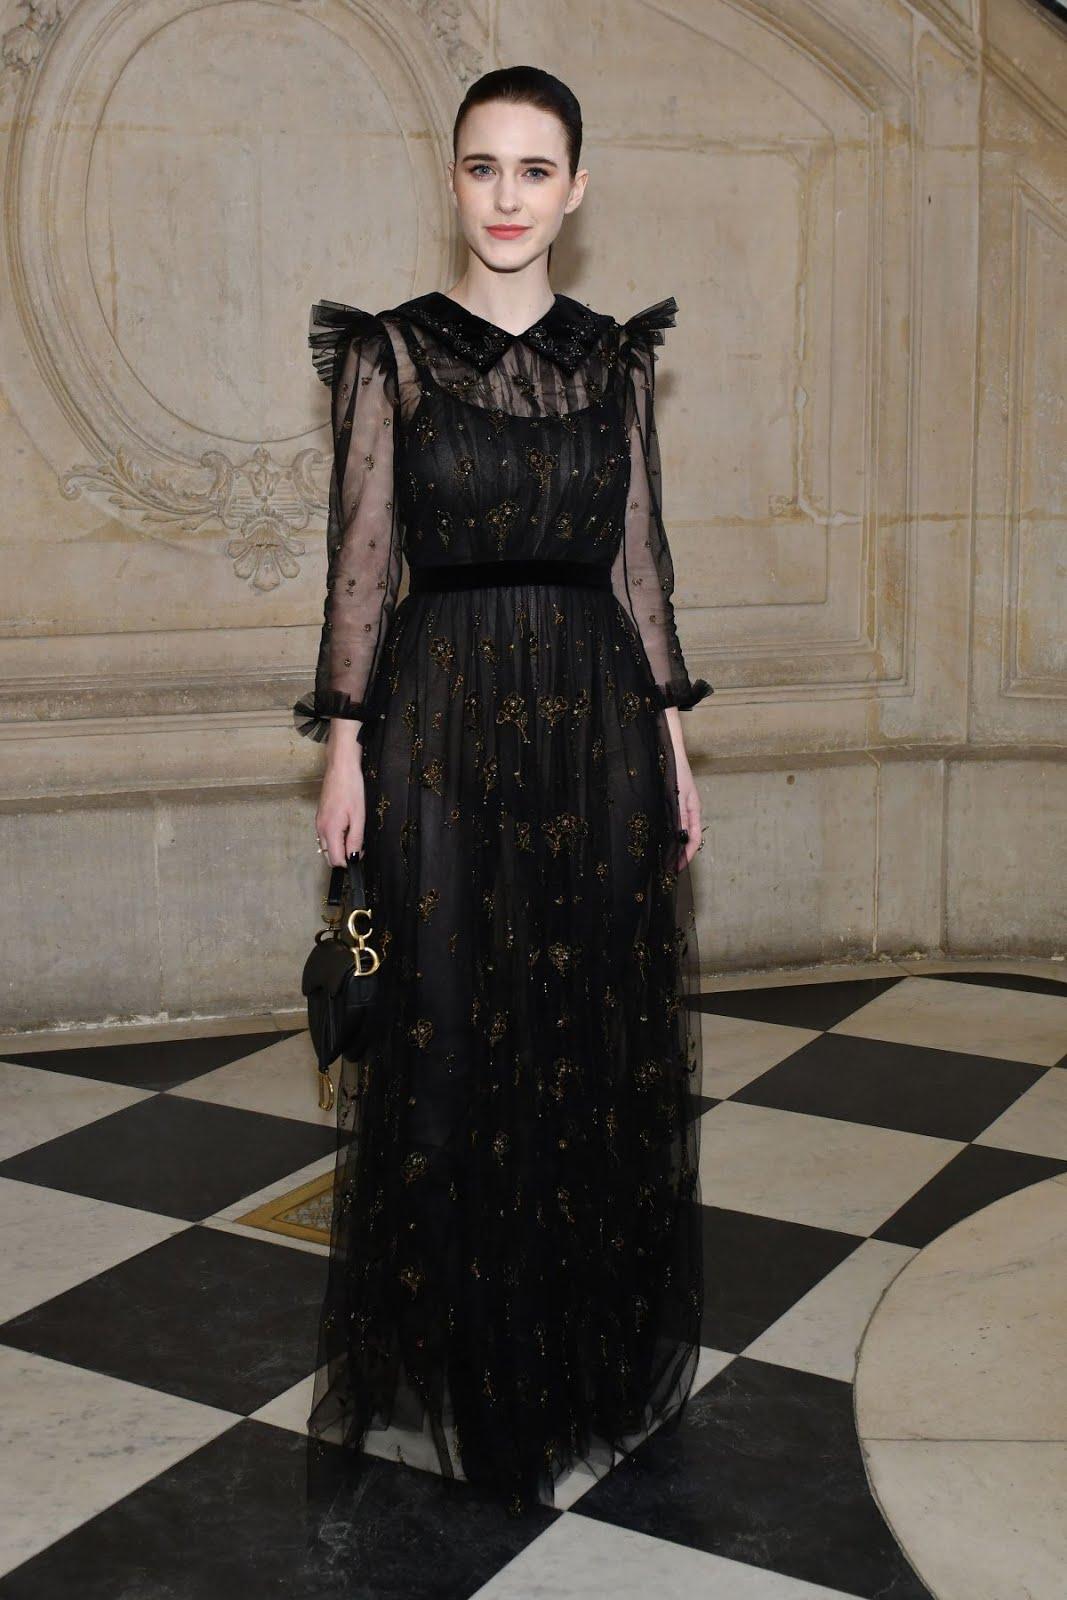 Paris Fashion Week: Christian Dior Spring 2019 Couture